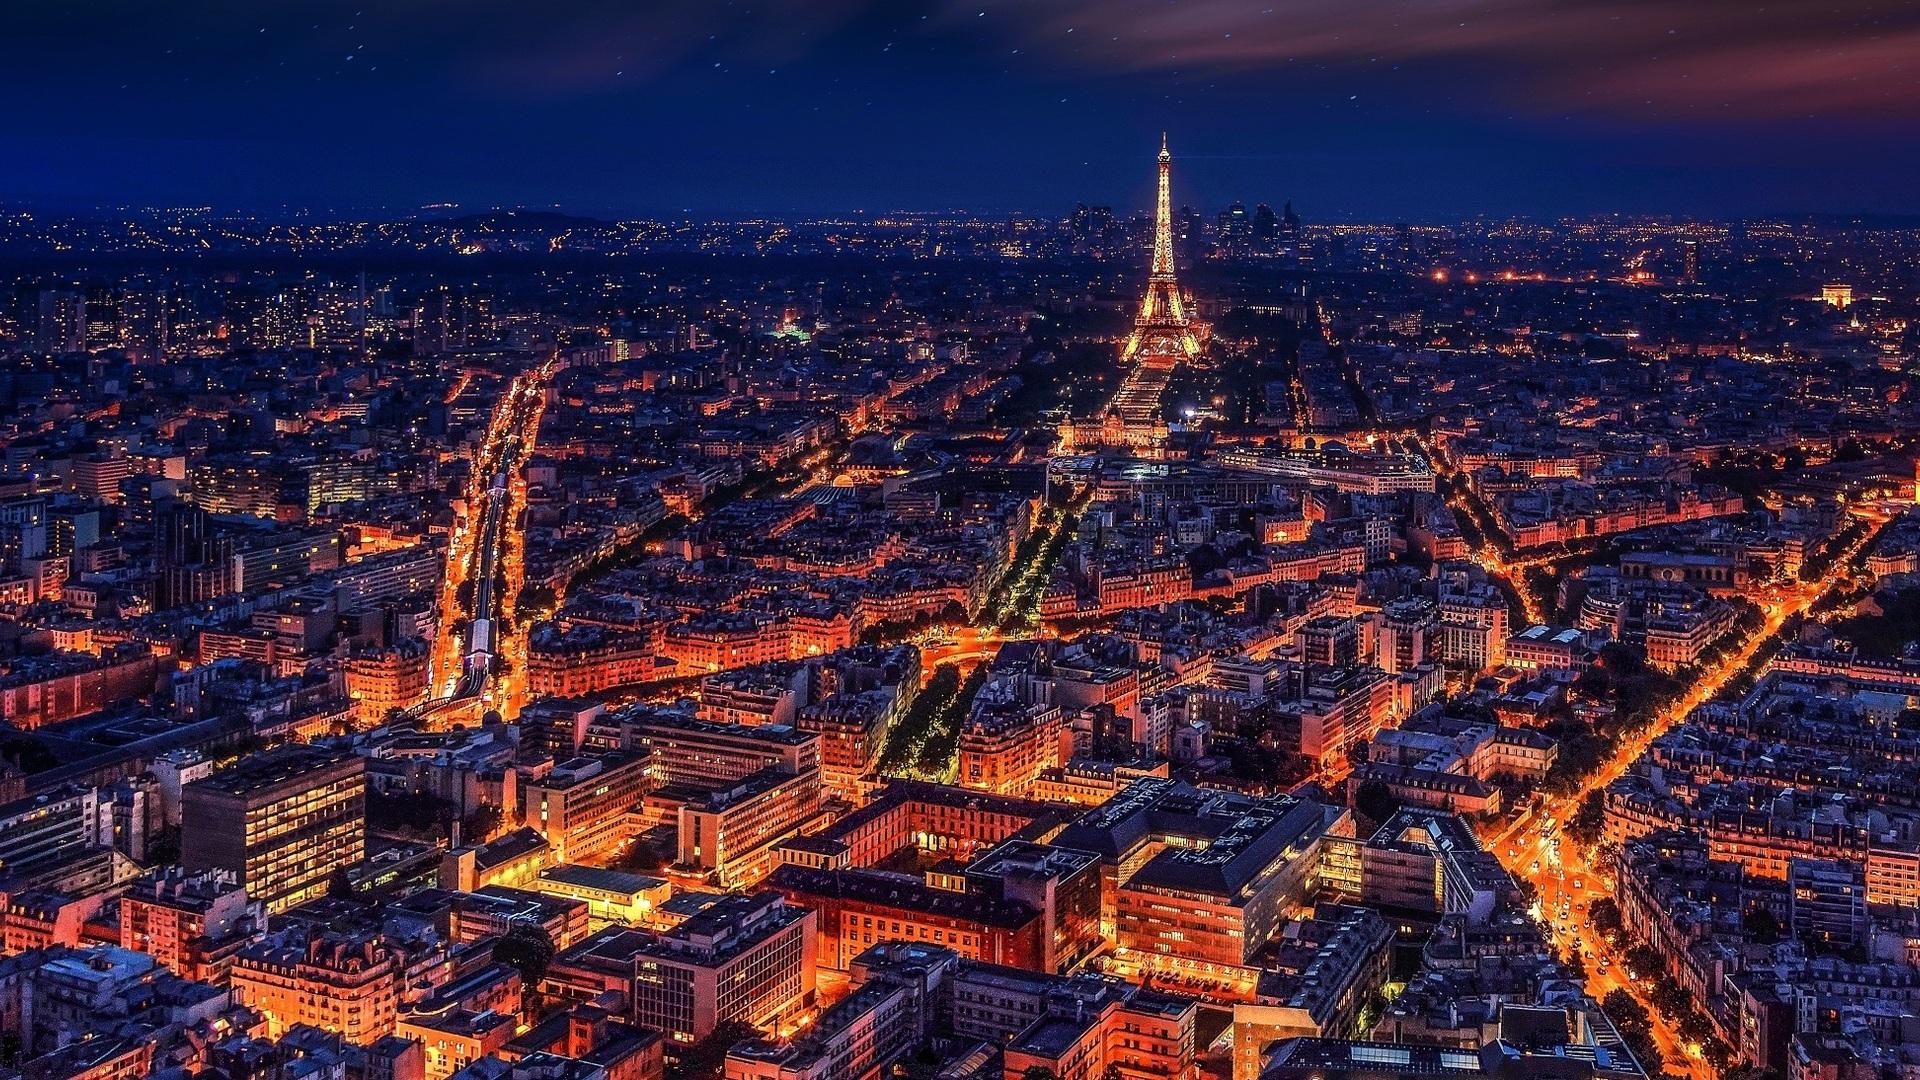 1920x1080 Paris France Eiffel Tower Night Laptop Full HD